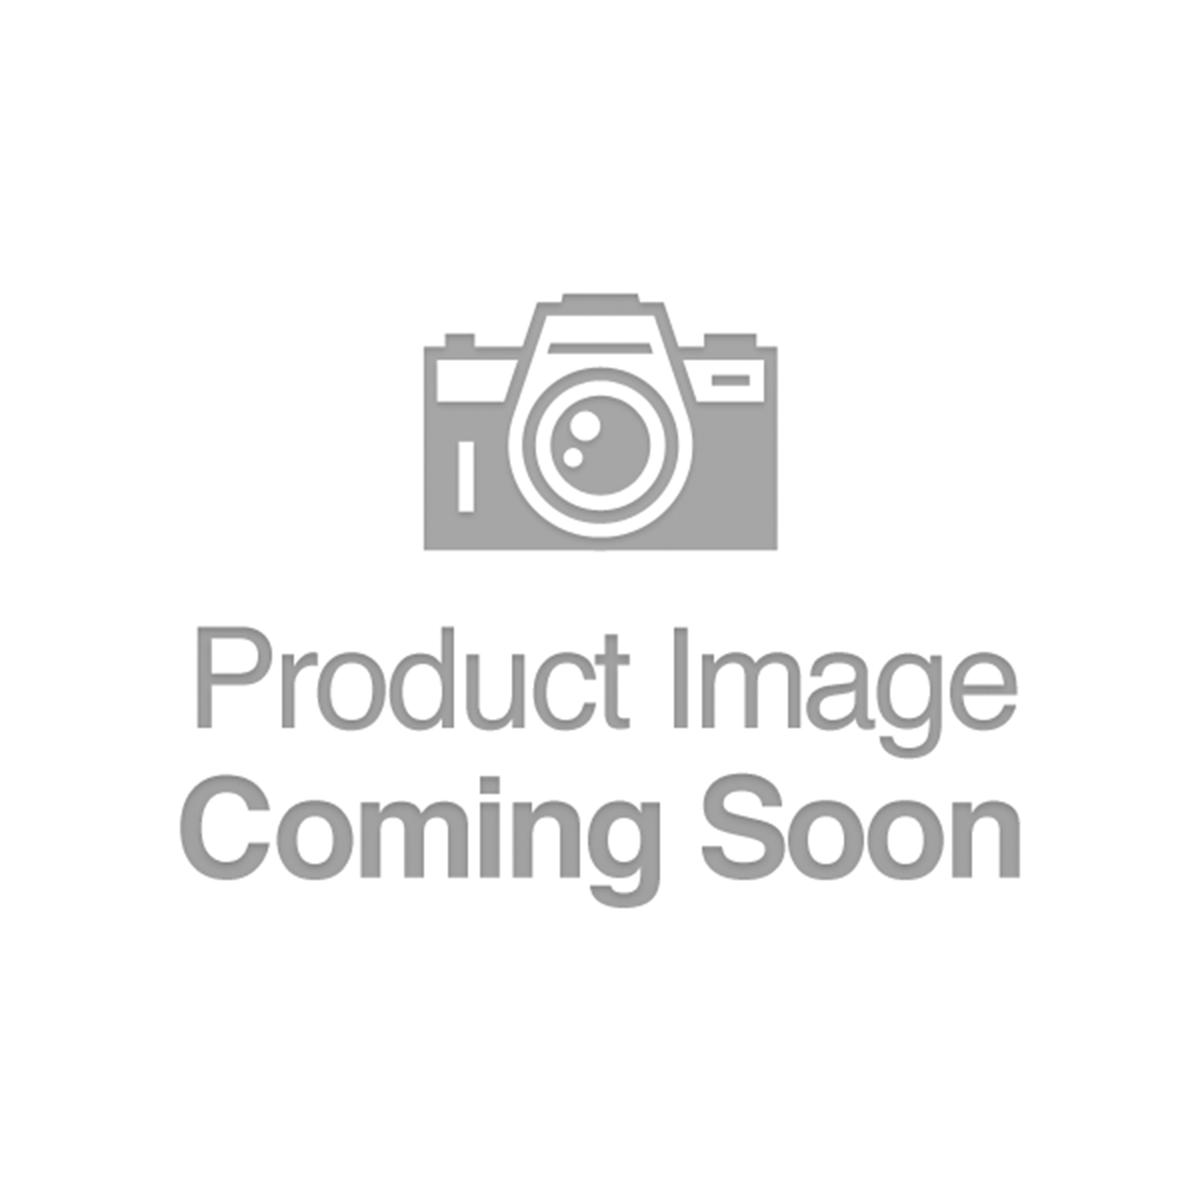 San Antonio - Texas - CH 5217 - FR 682 - PCGS 66 PPQ - National Bank Note